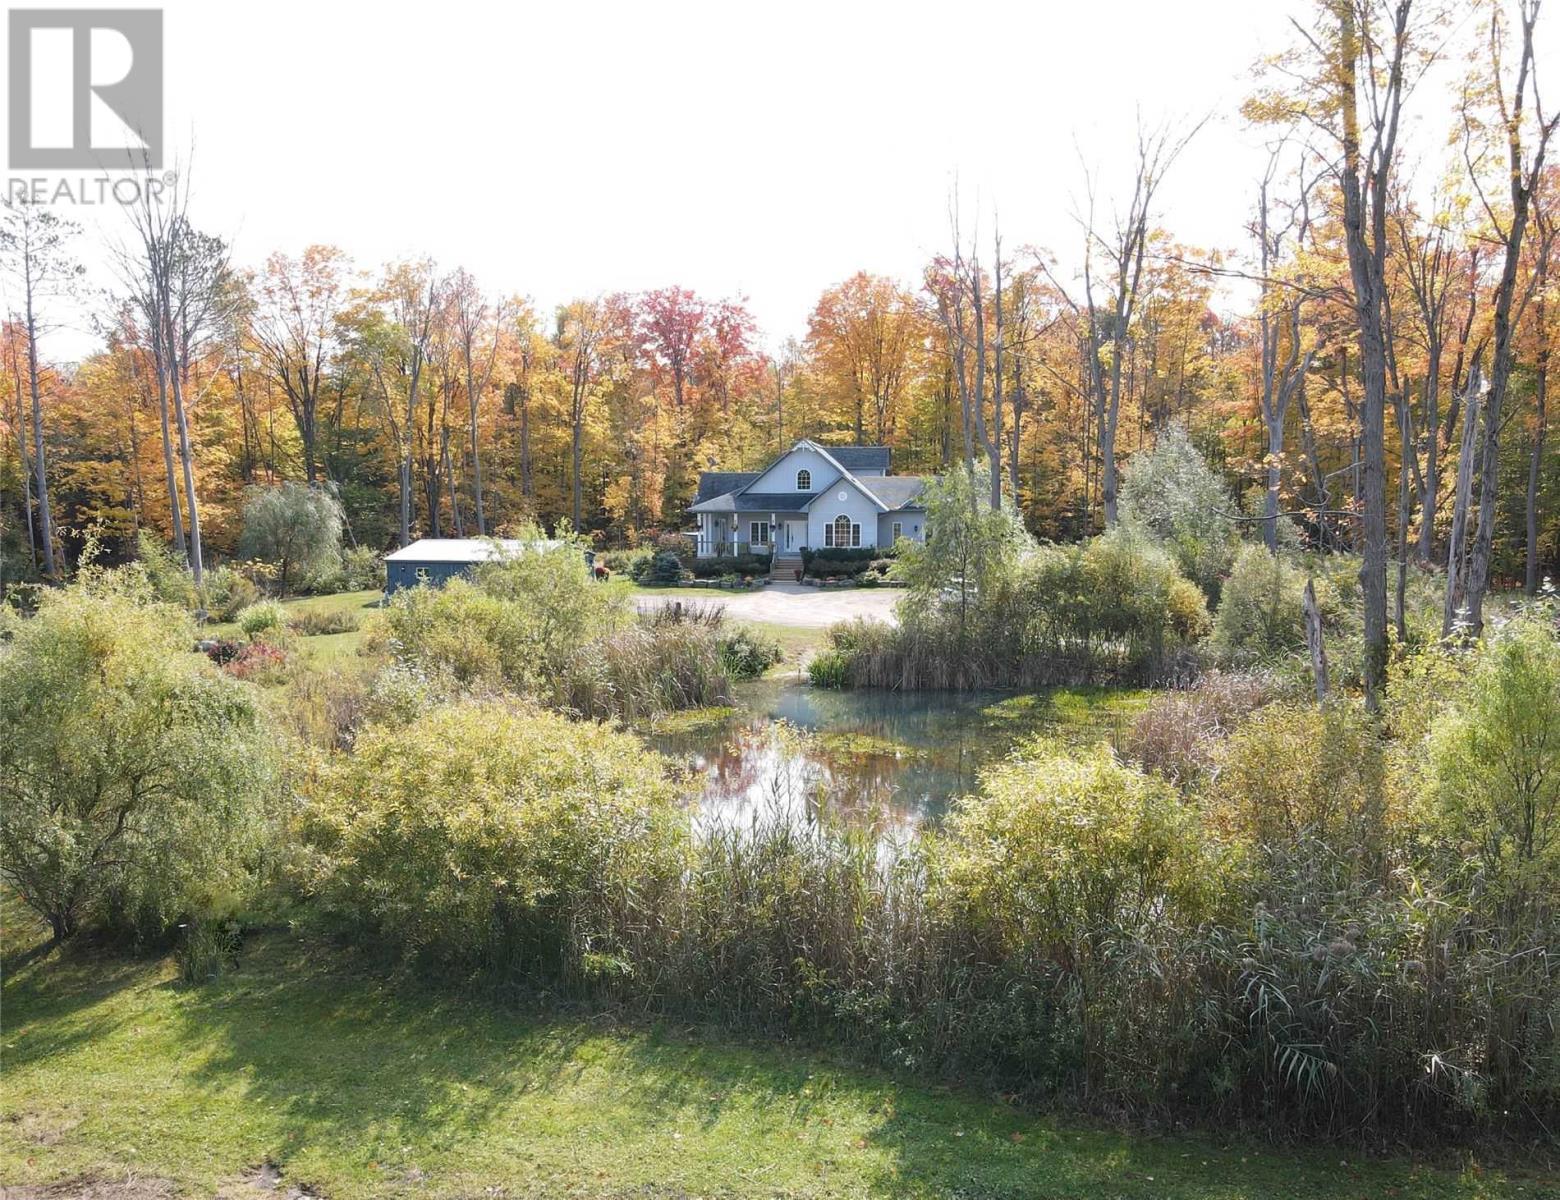 3591 Davis Dr, Whitchurch-Stouffville, Ontario  L4A 2K2 - Photo 3 - N4950692